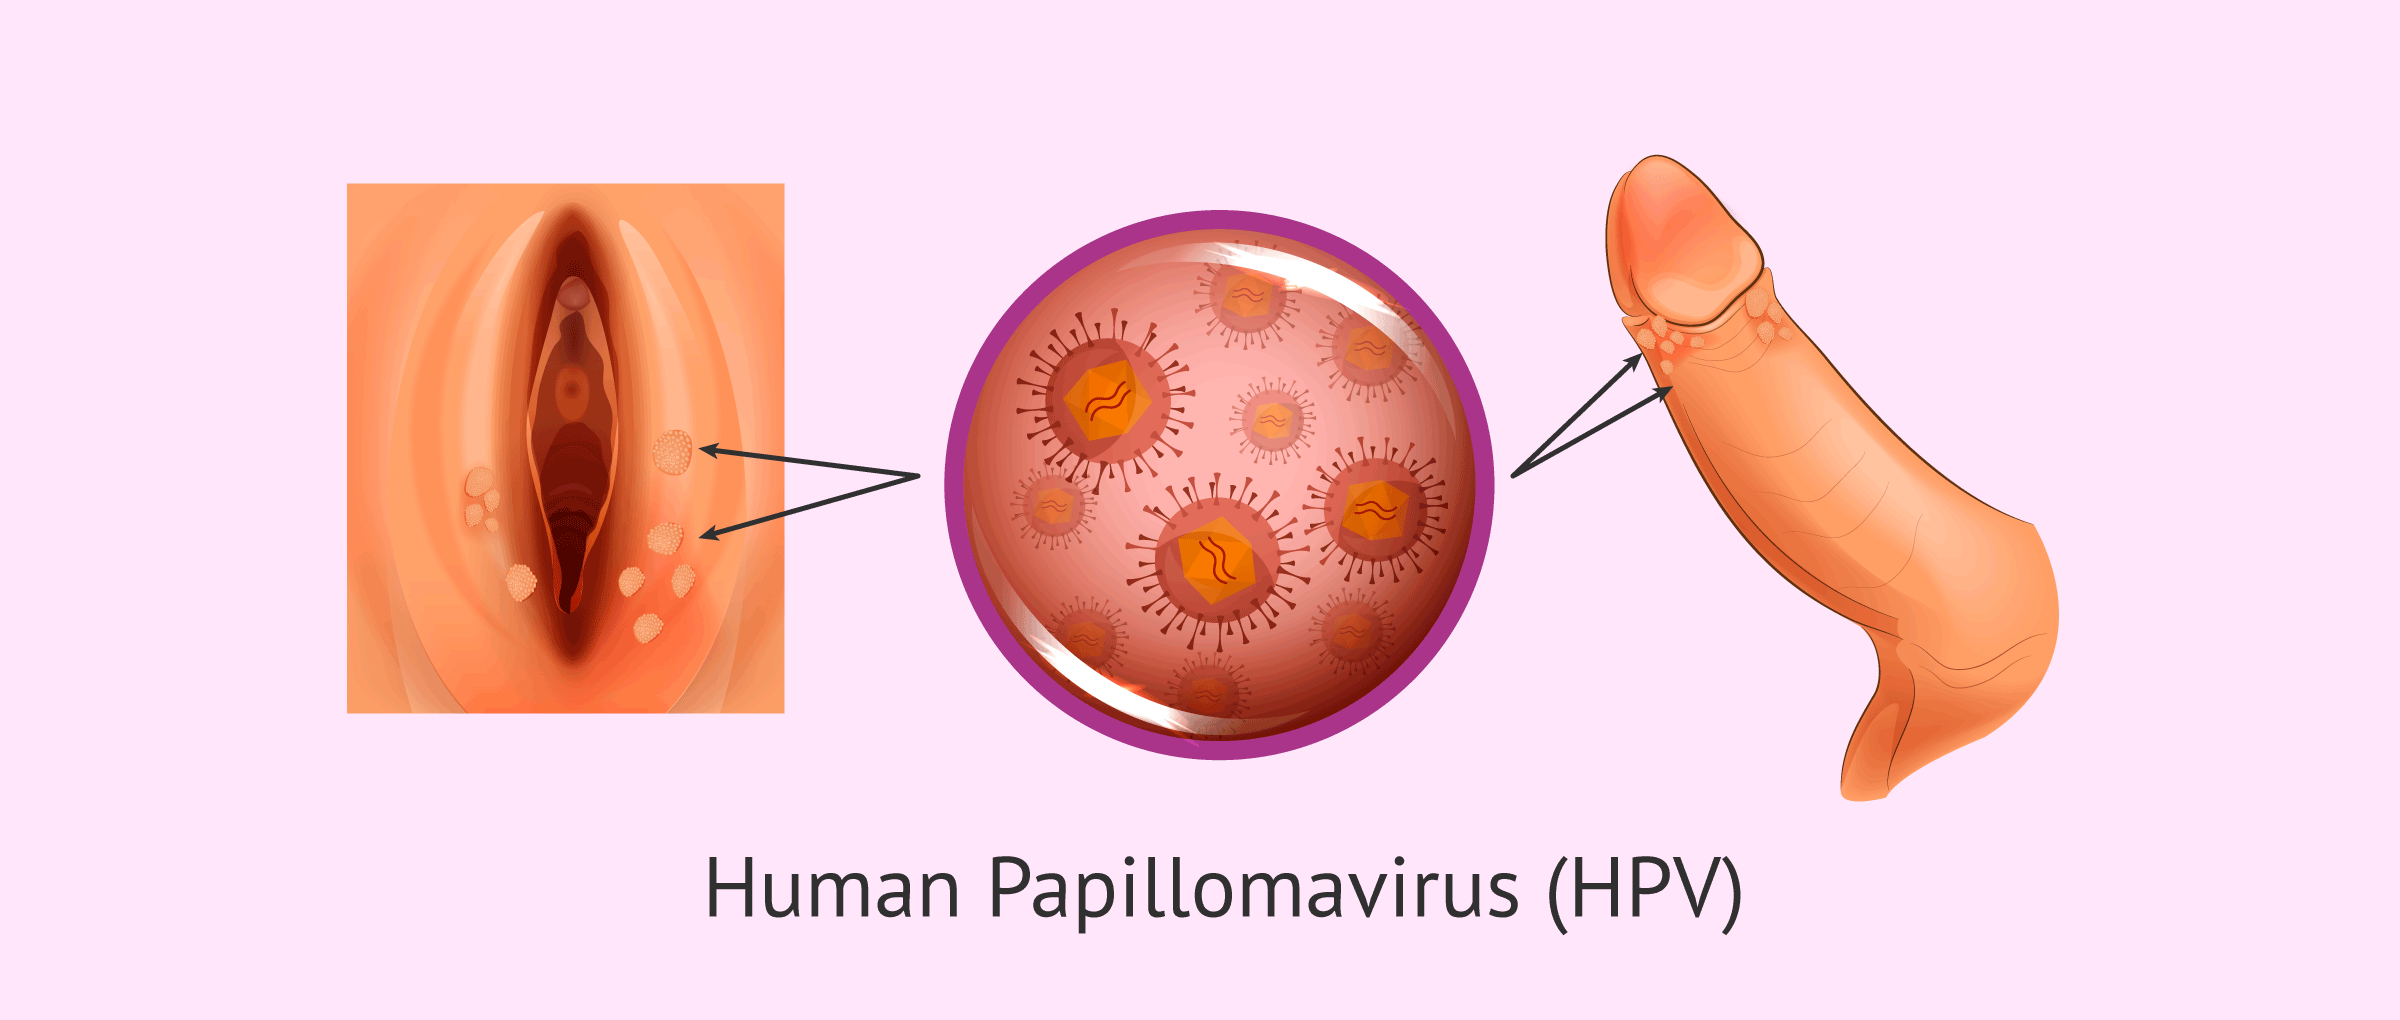 hpv genital warts cancer)